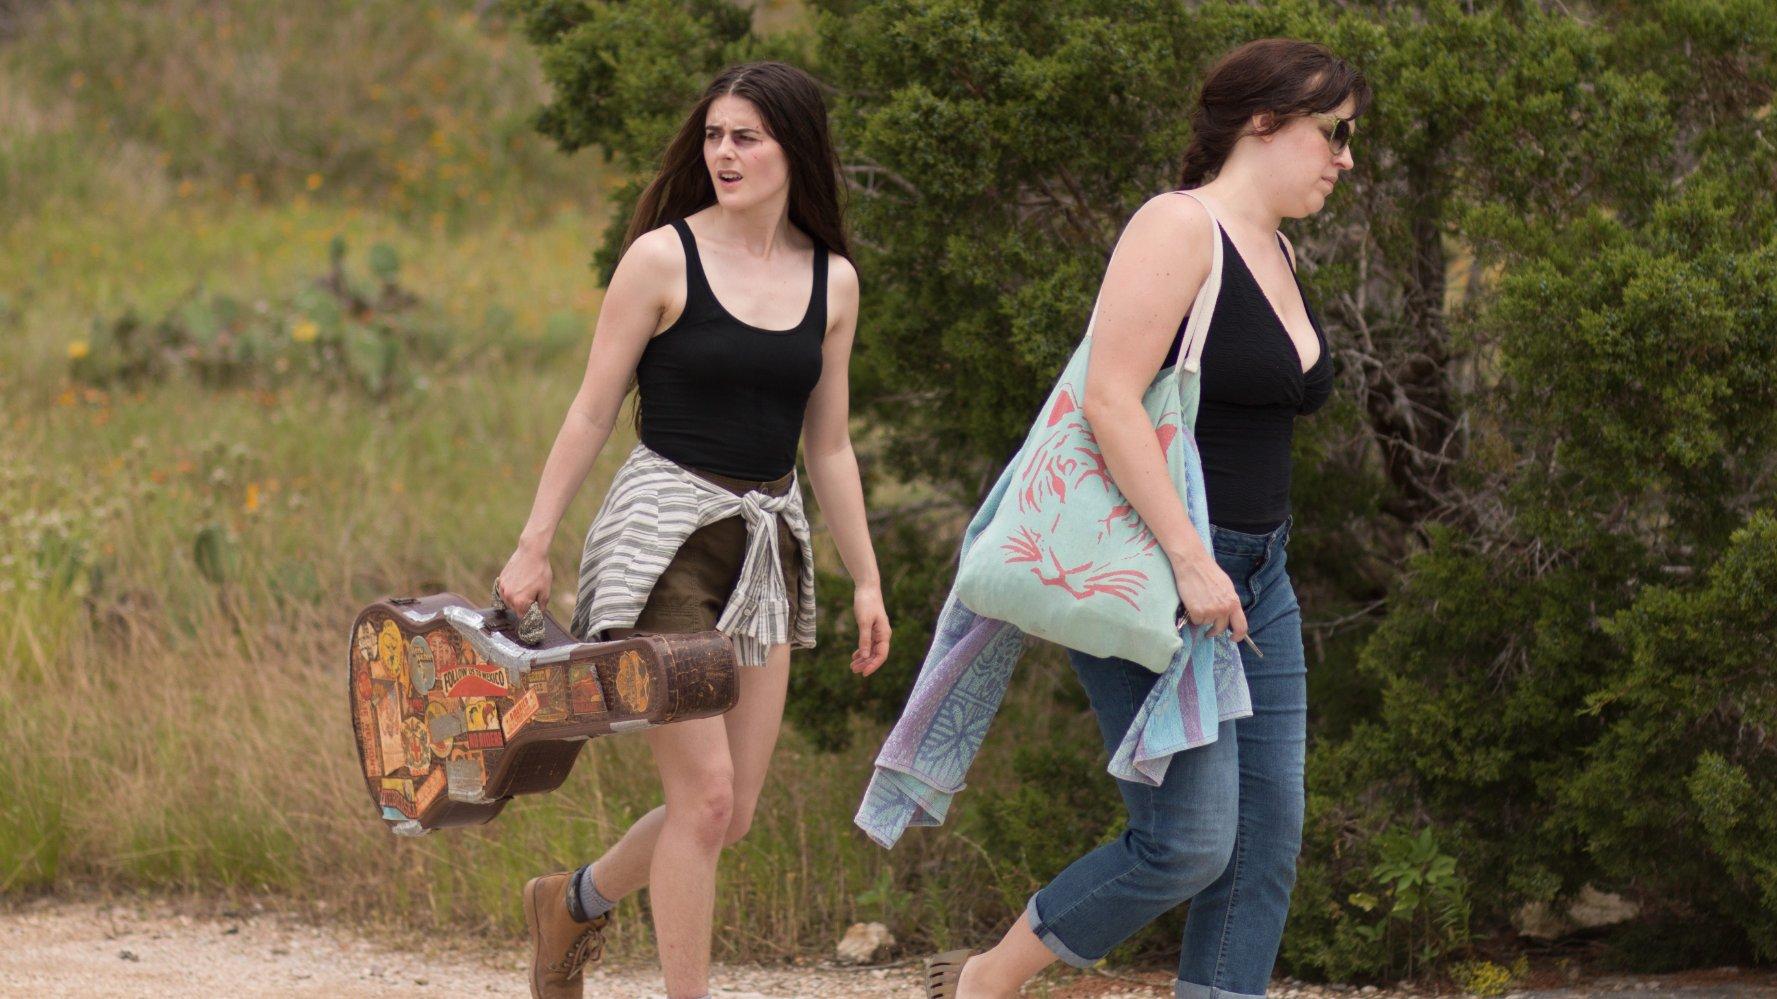 Sophie Reid and Allison Tolman in Jason Cortlund and Julia Halperin's film La Barracuda.